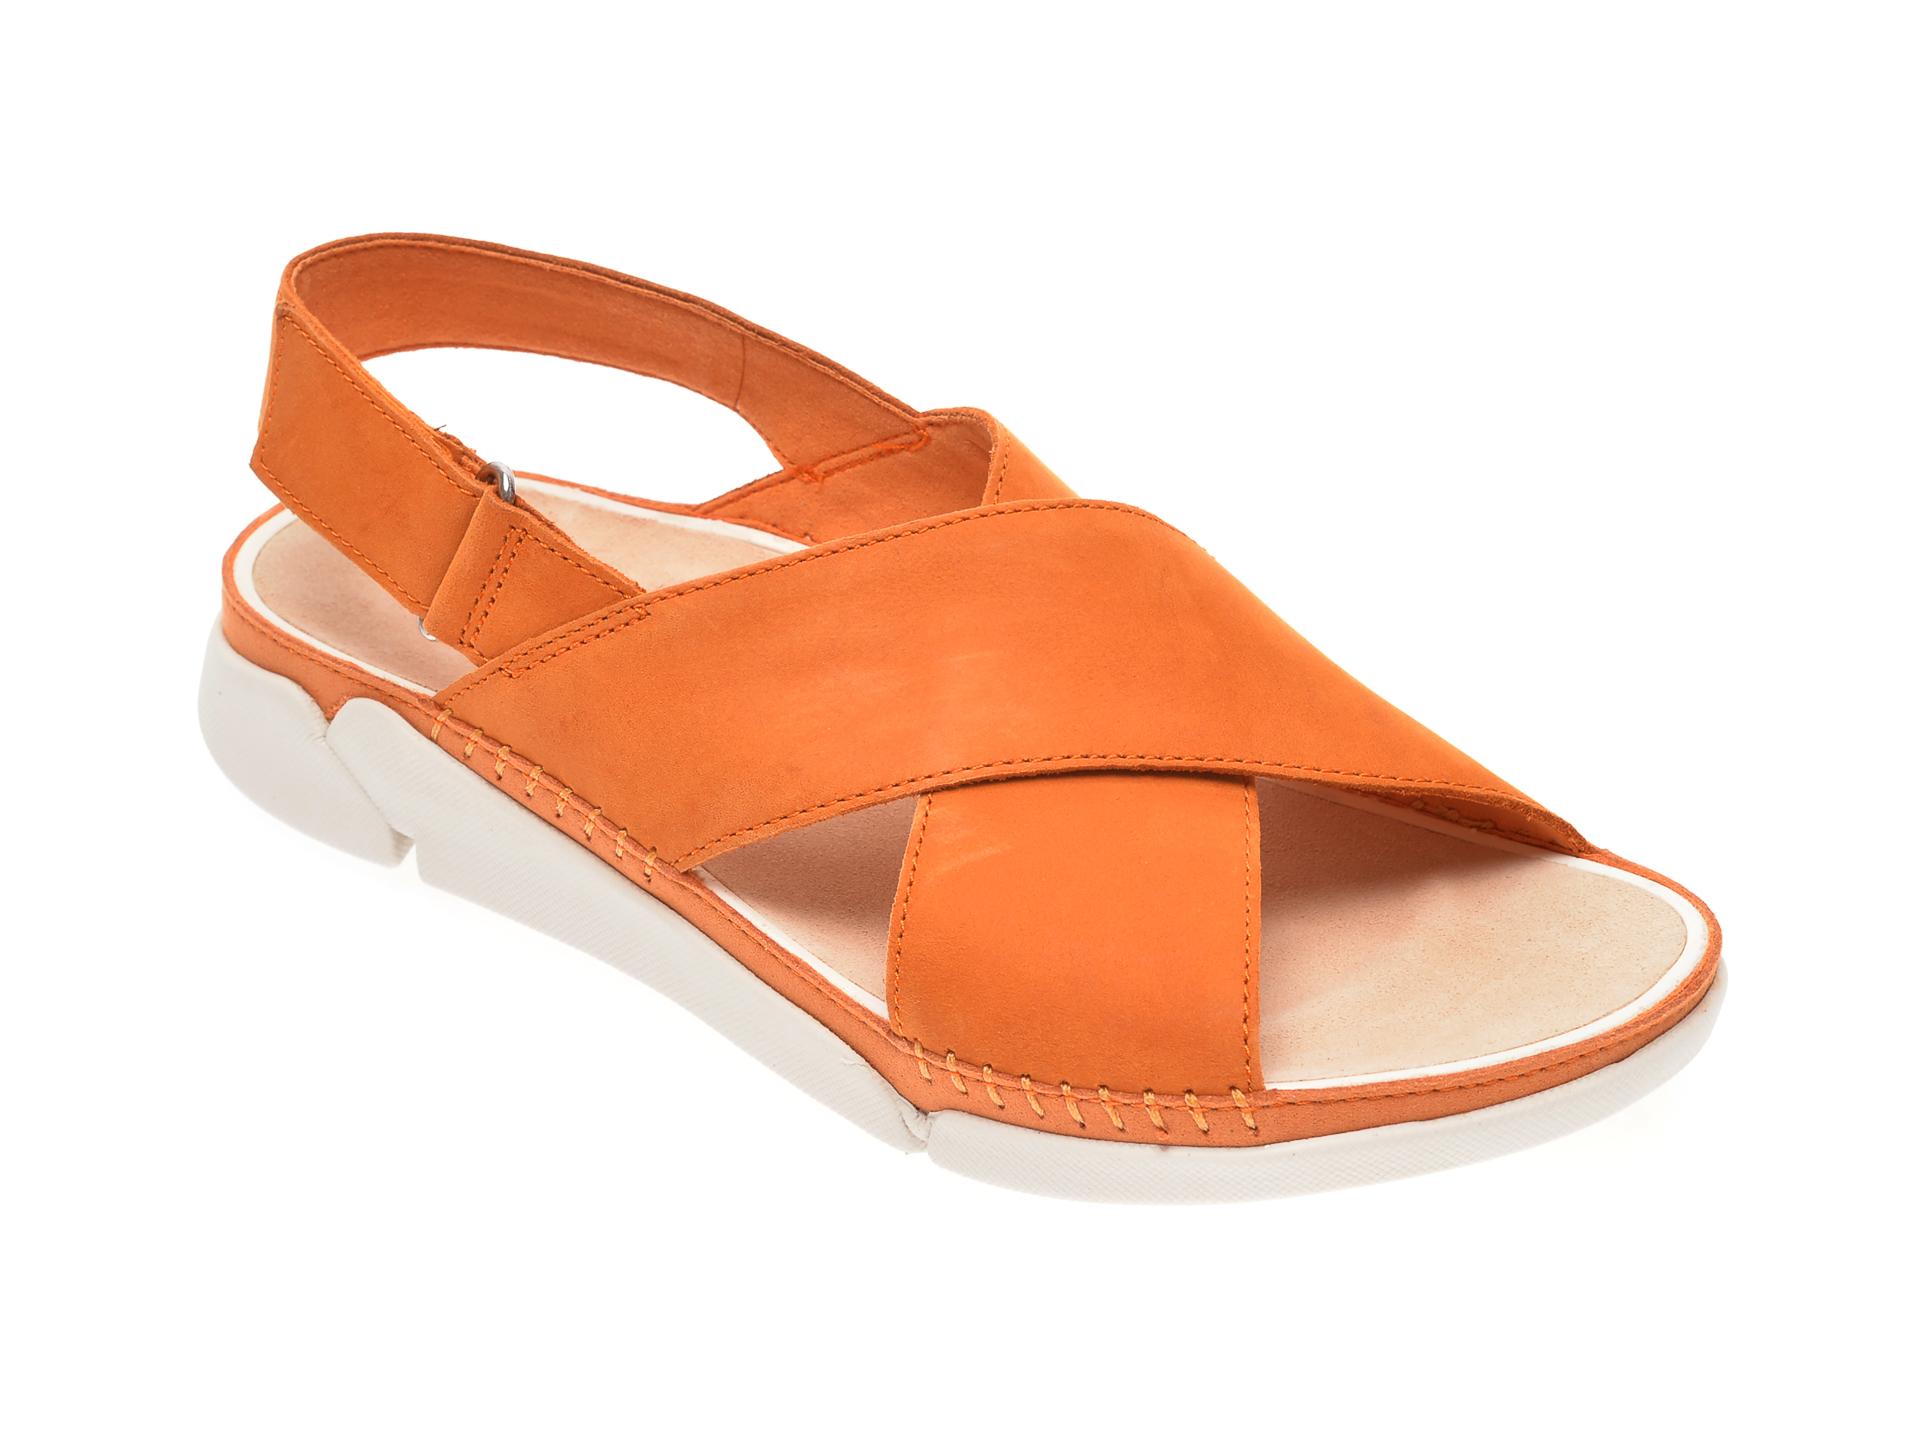 Sandale CLARKS portocalii, Tri Alexia, din nabuc